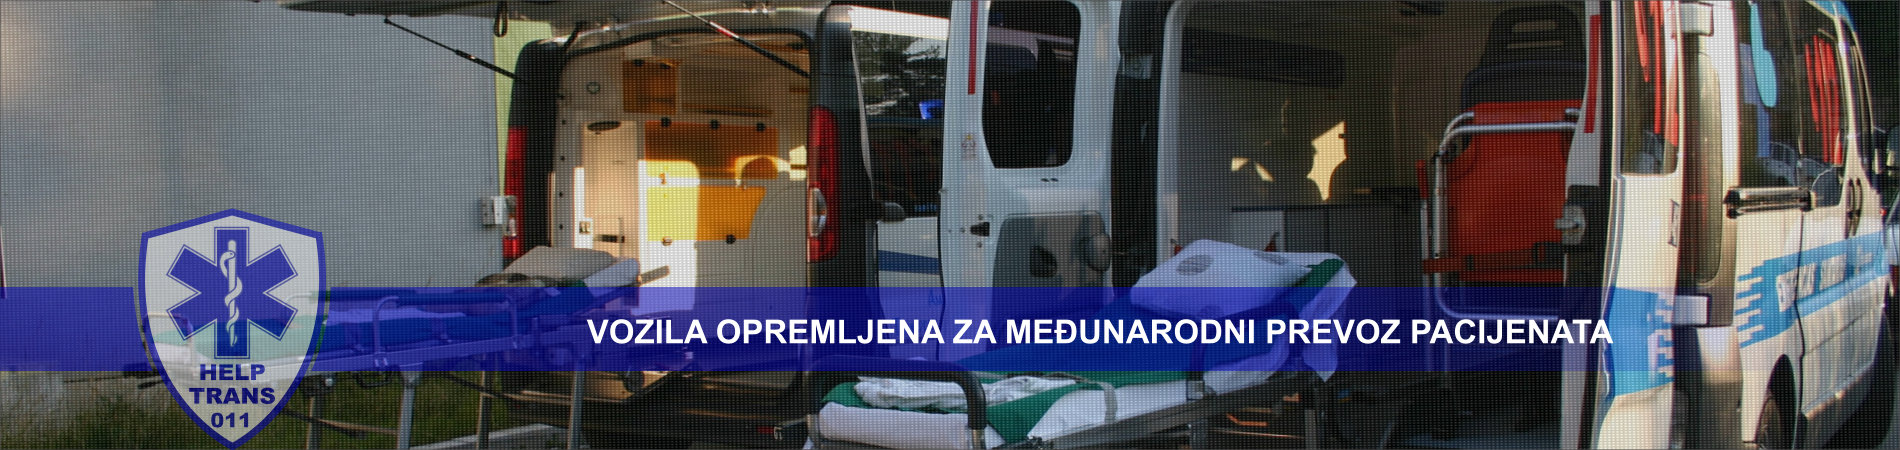 Vozila opremljena za međunarodni prevoz pacijenata